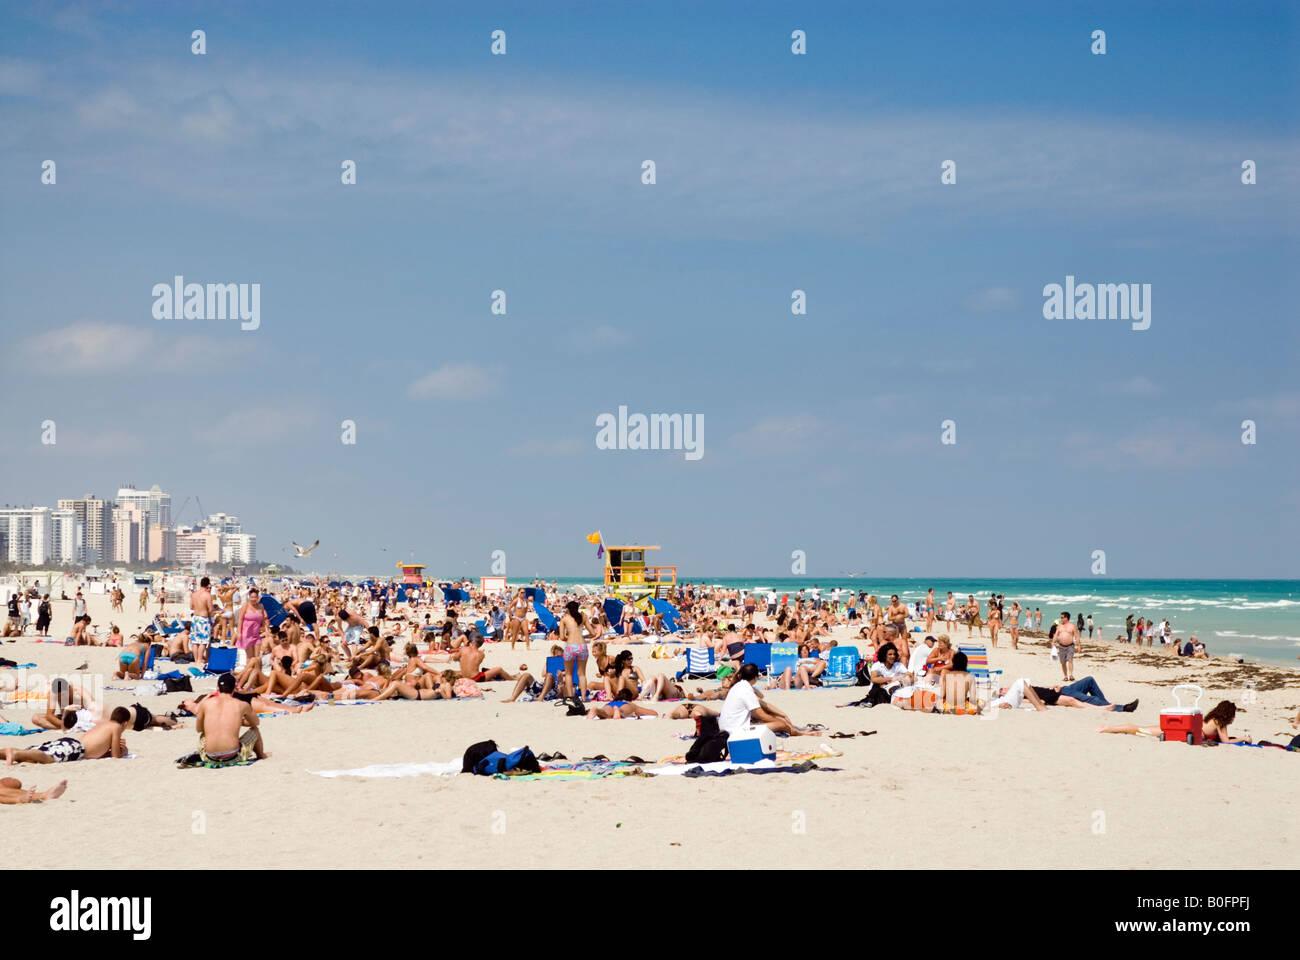 South Beach, Miami, Florida, EE.UU. Imagen De Stock